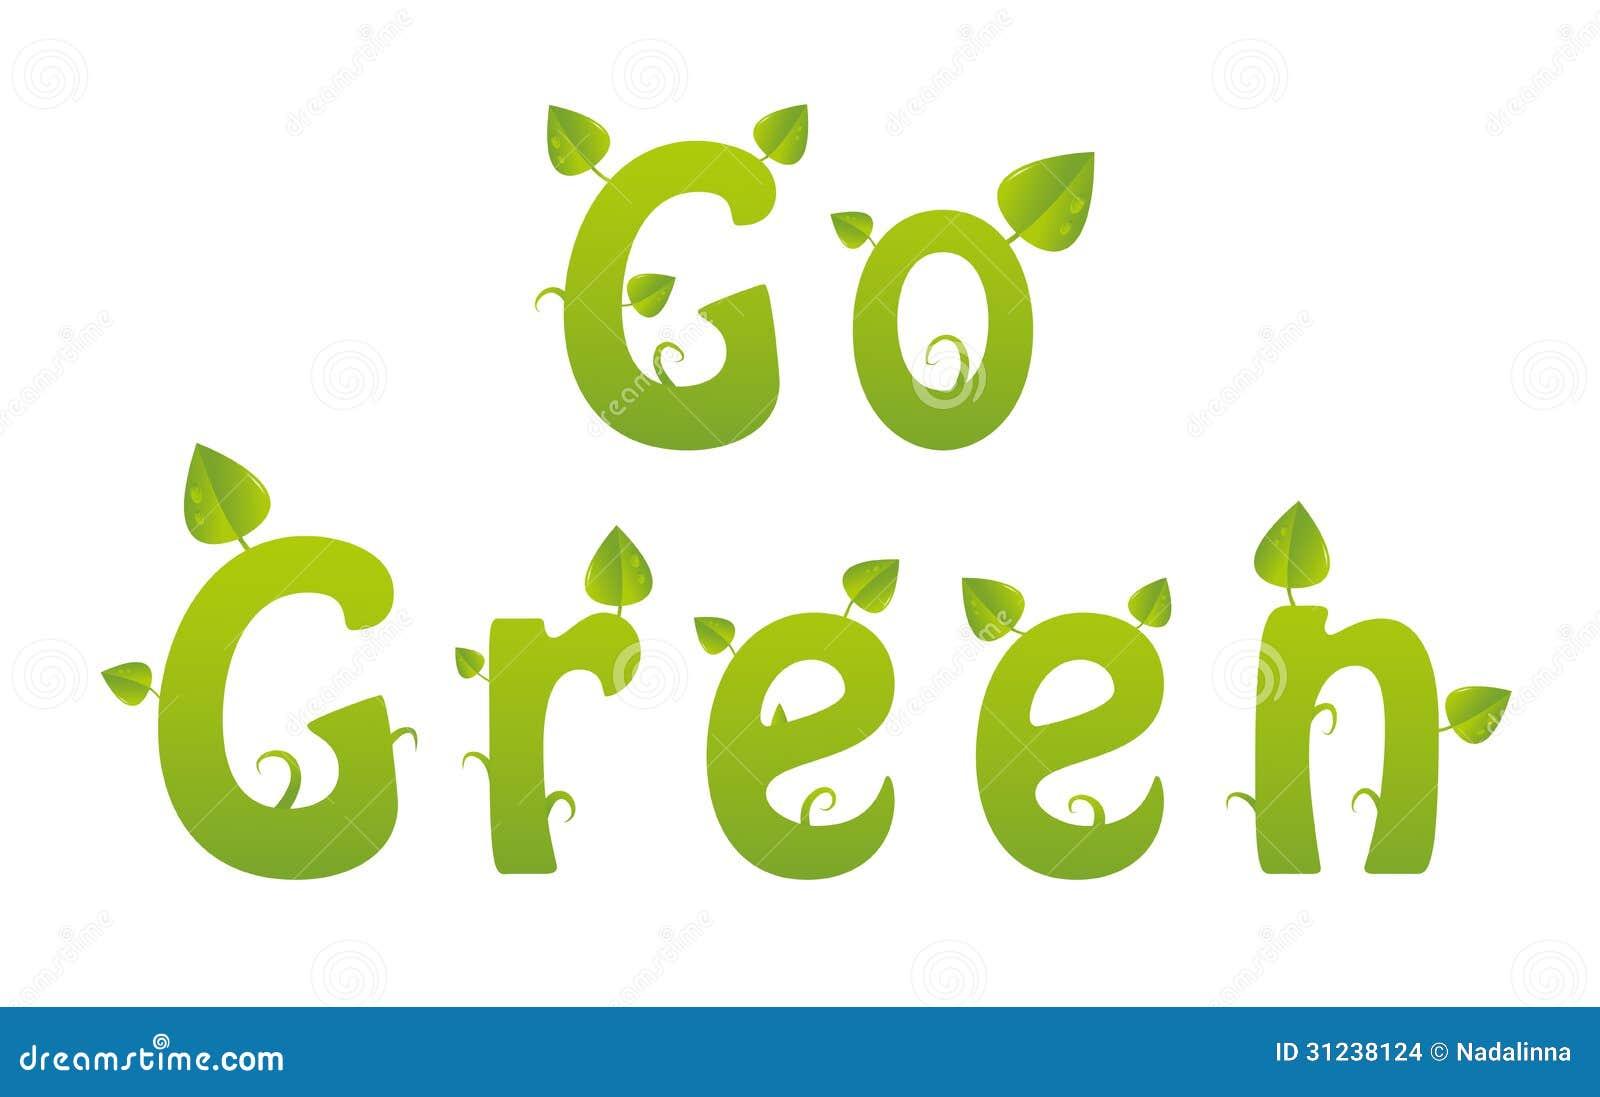 go green word